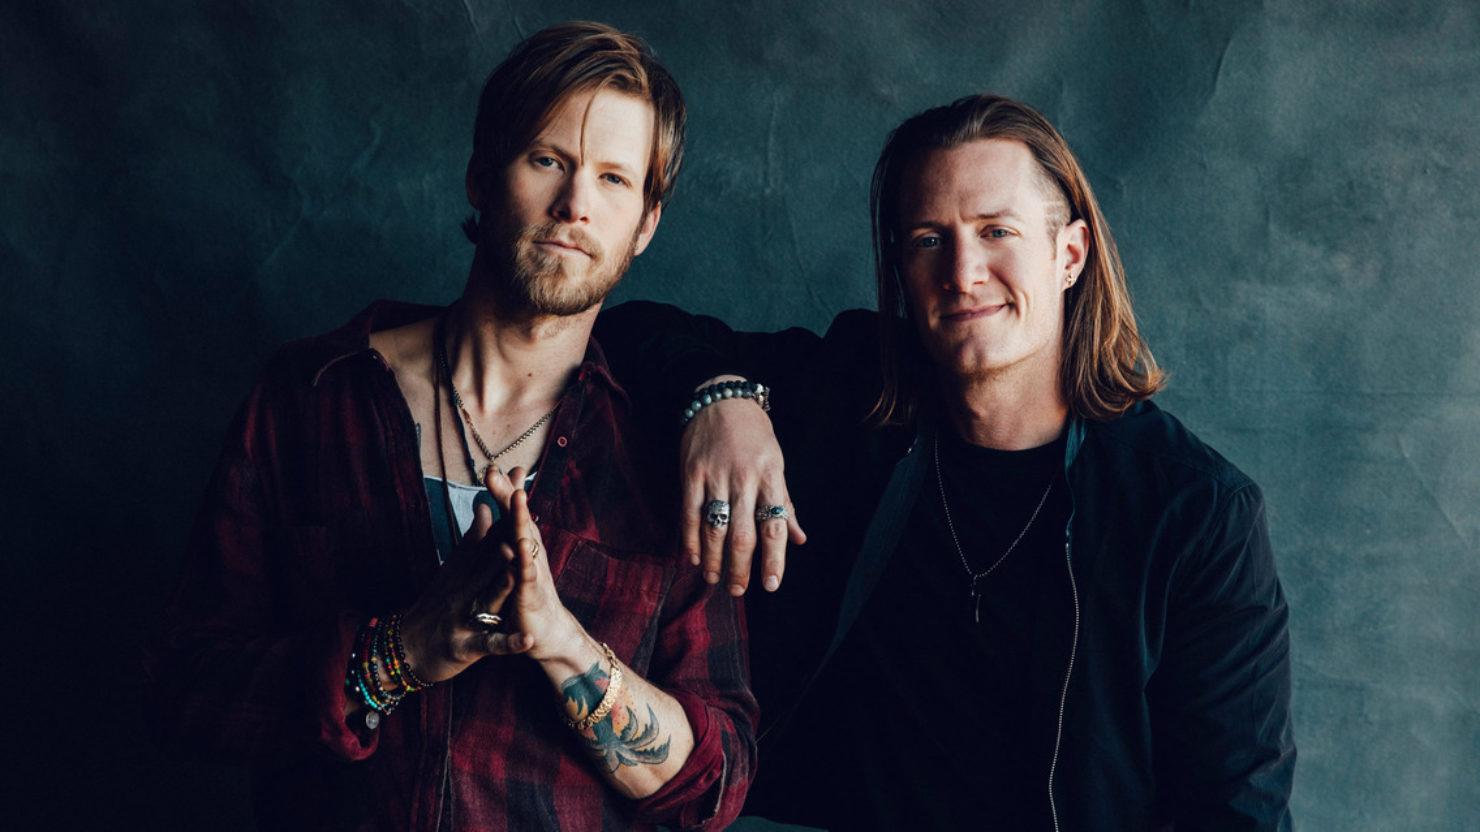 bellamy brothers tour 2018